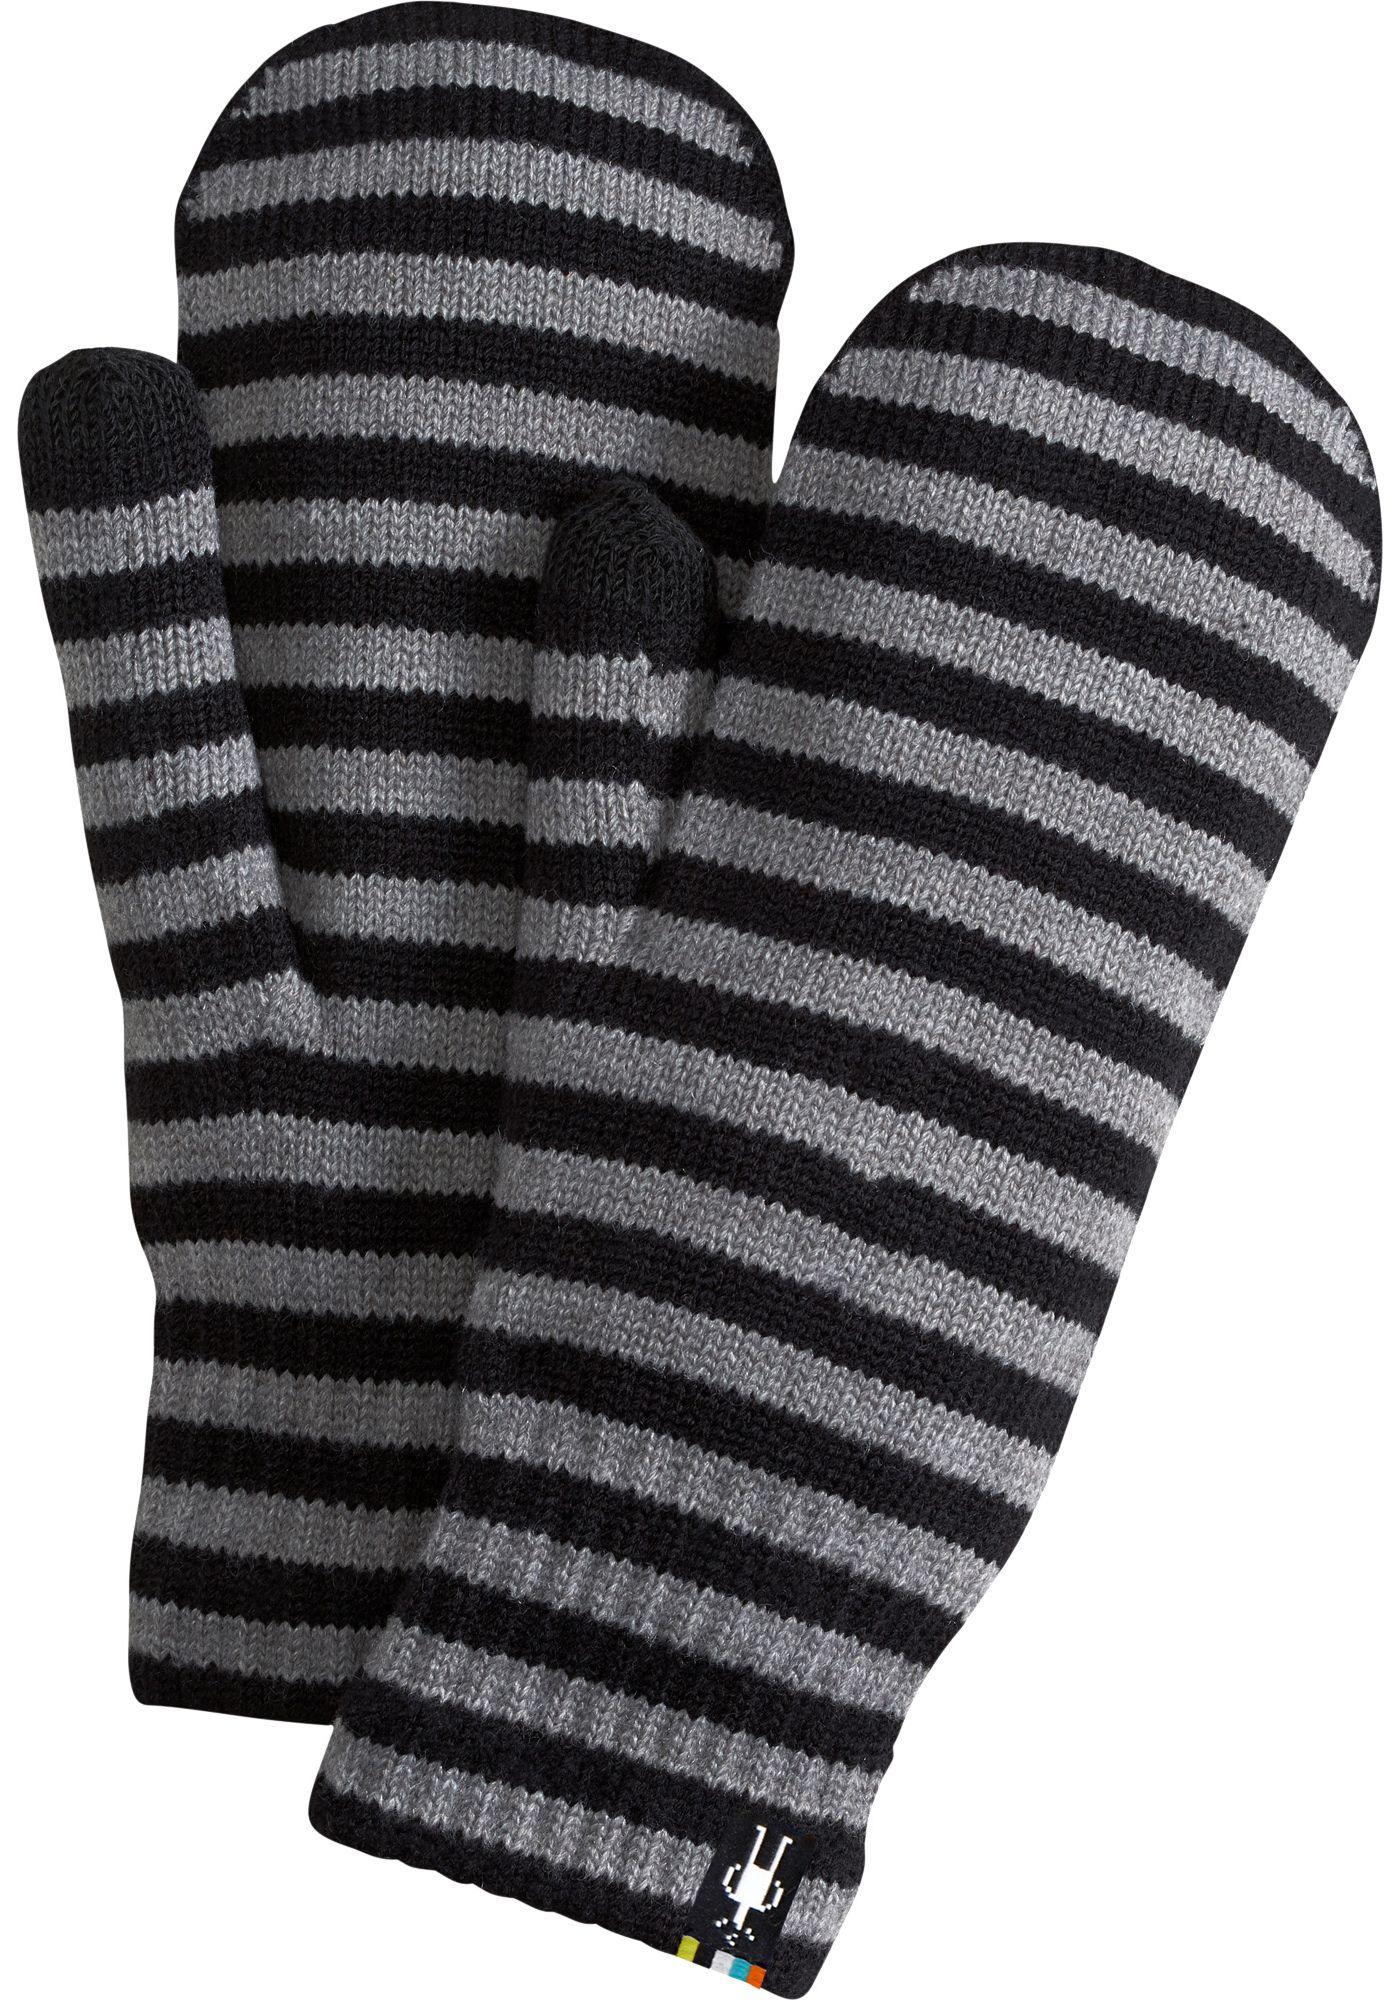 Smartwool Striped Knit Mittens